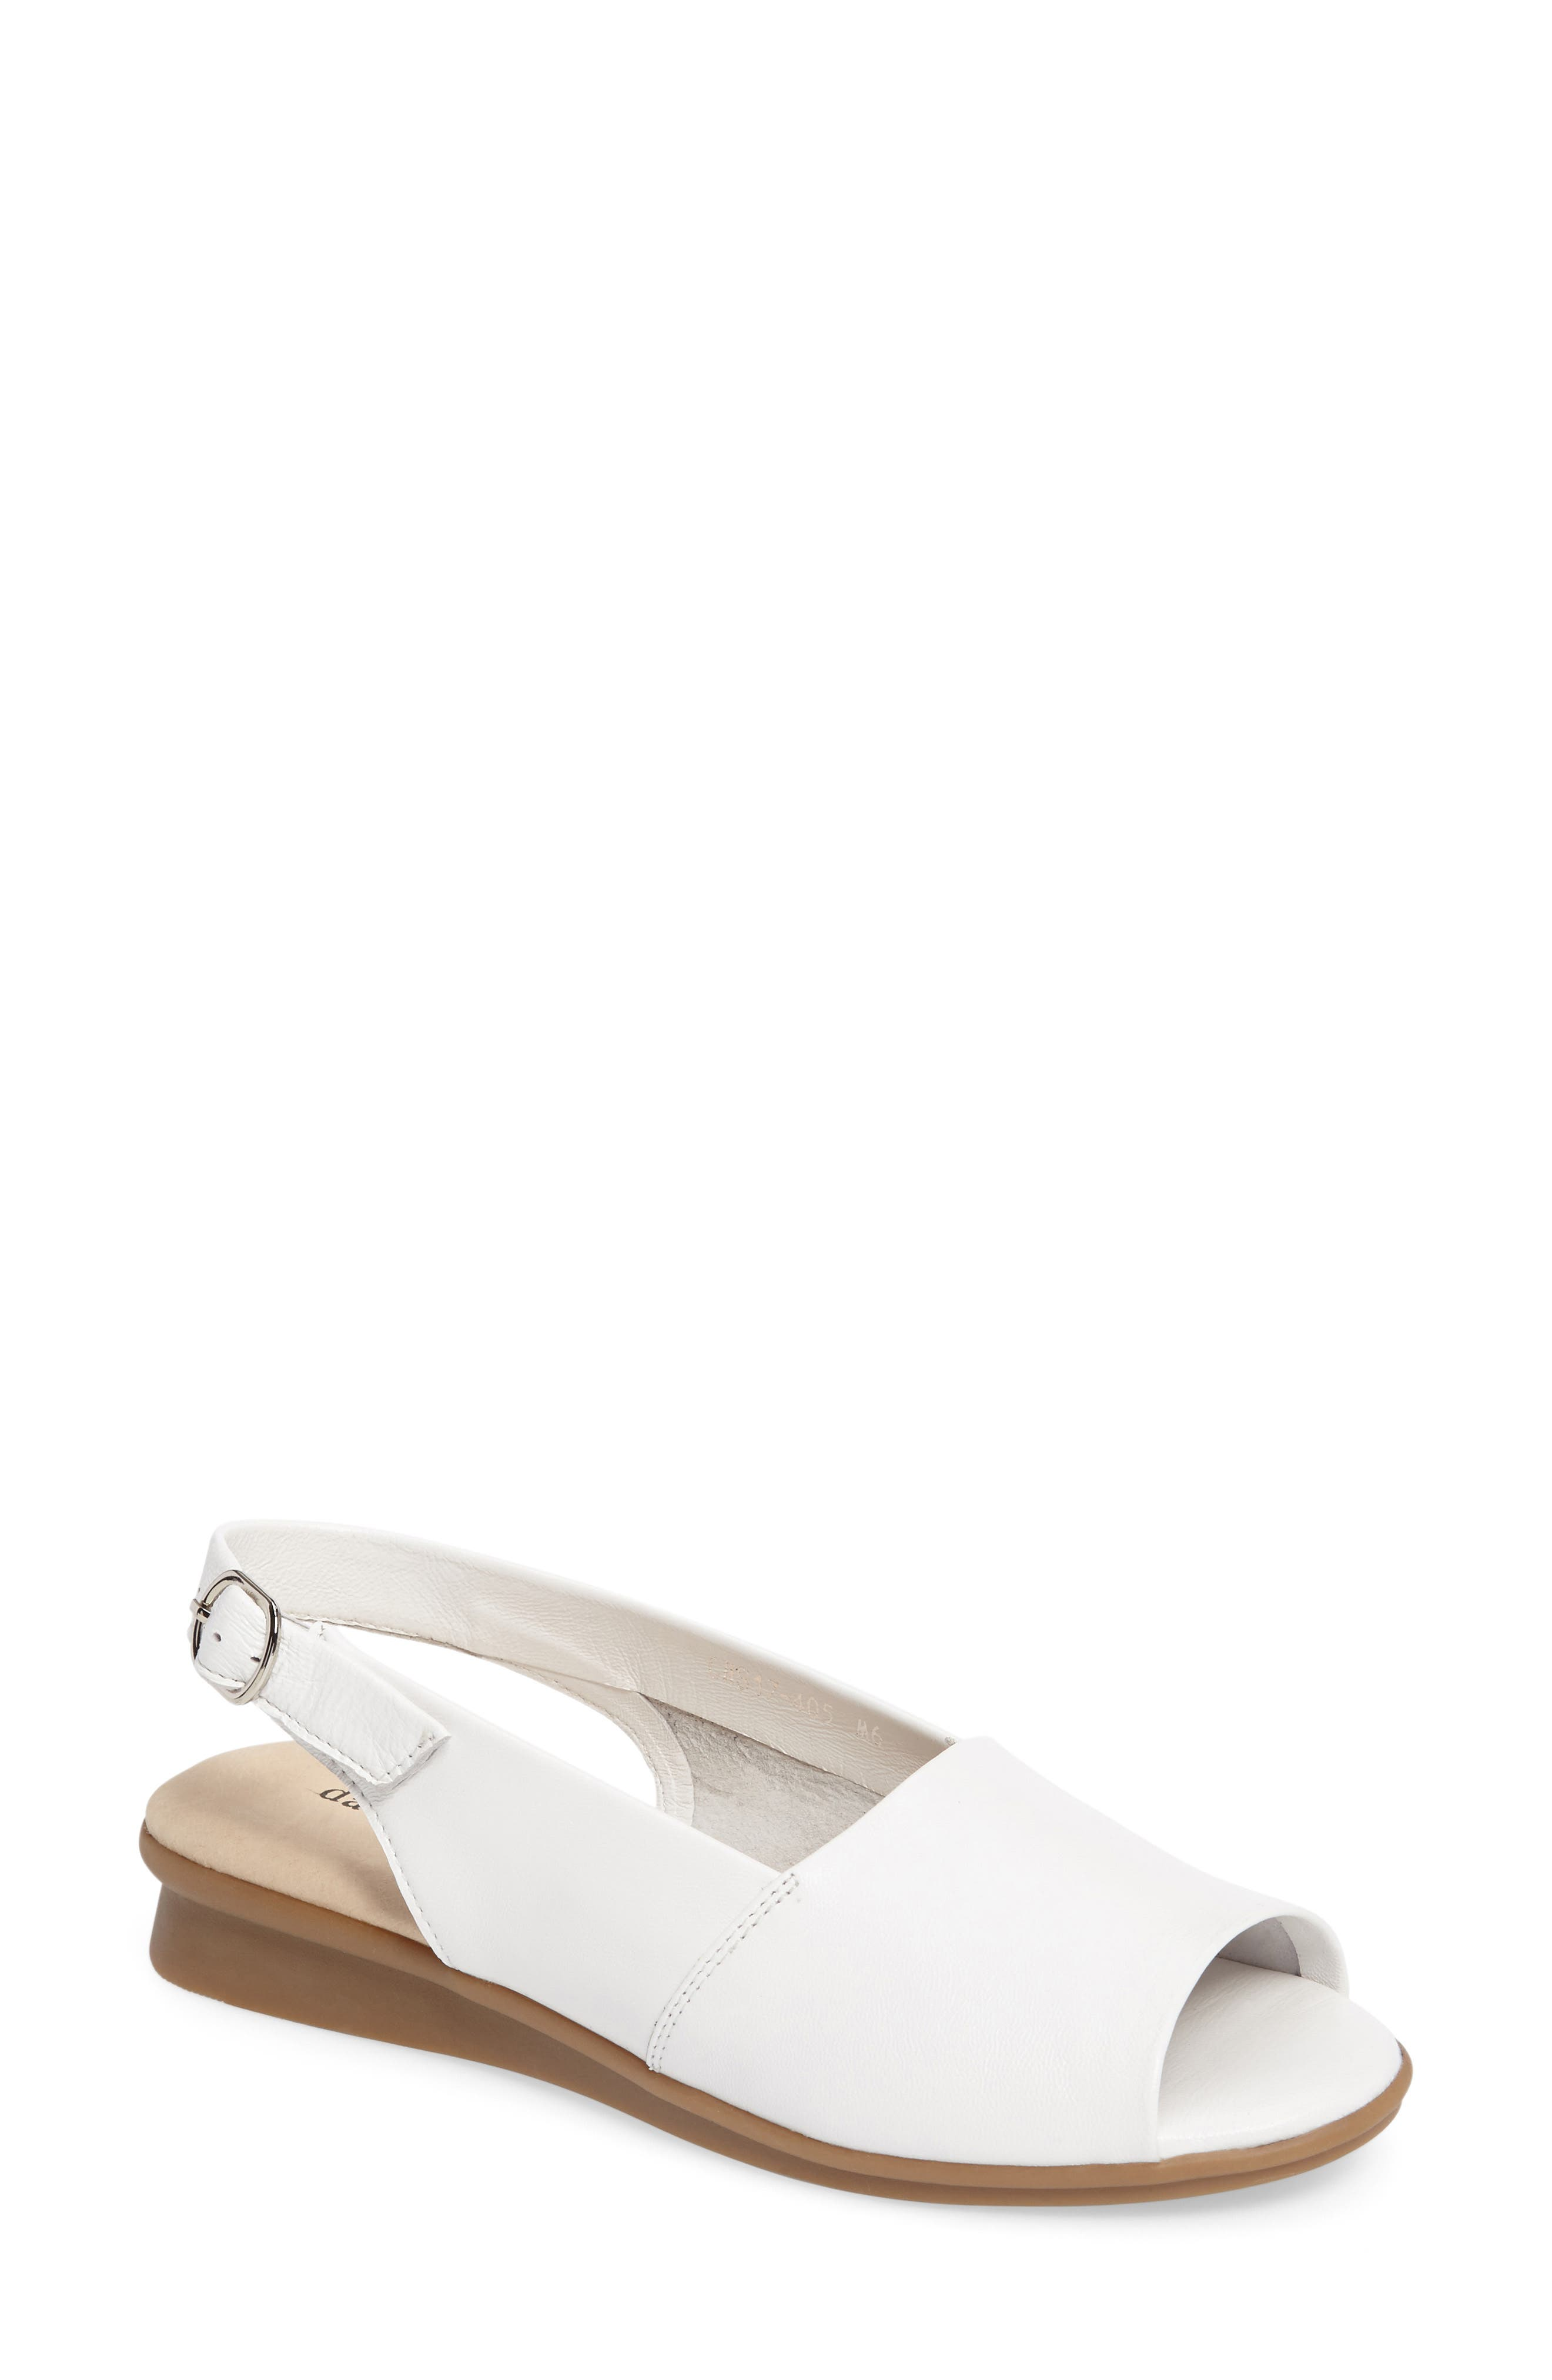 DAVID TATE Norma Slingback Sandal